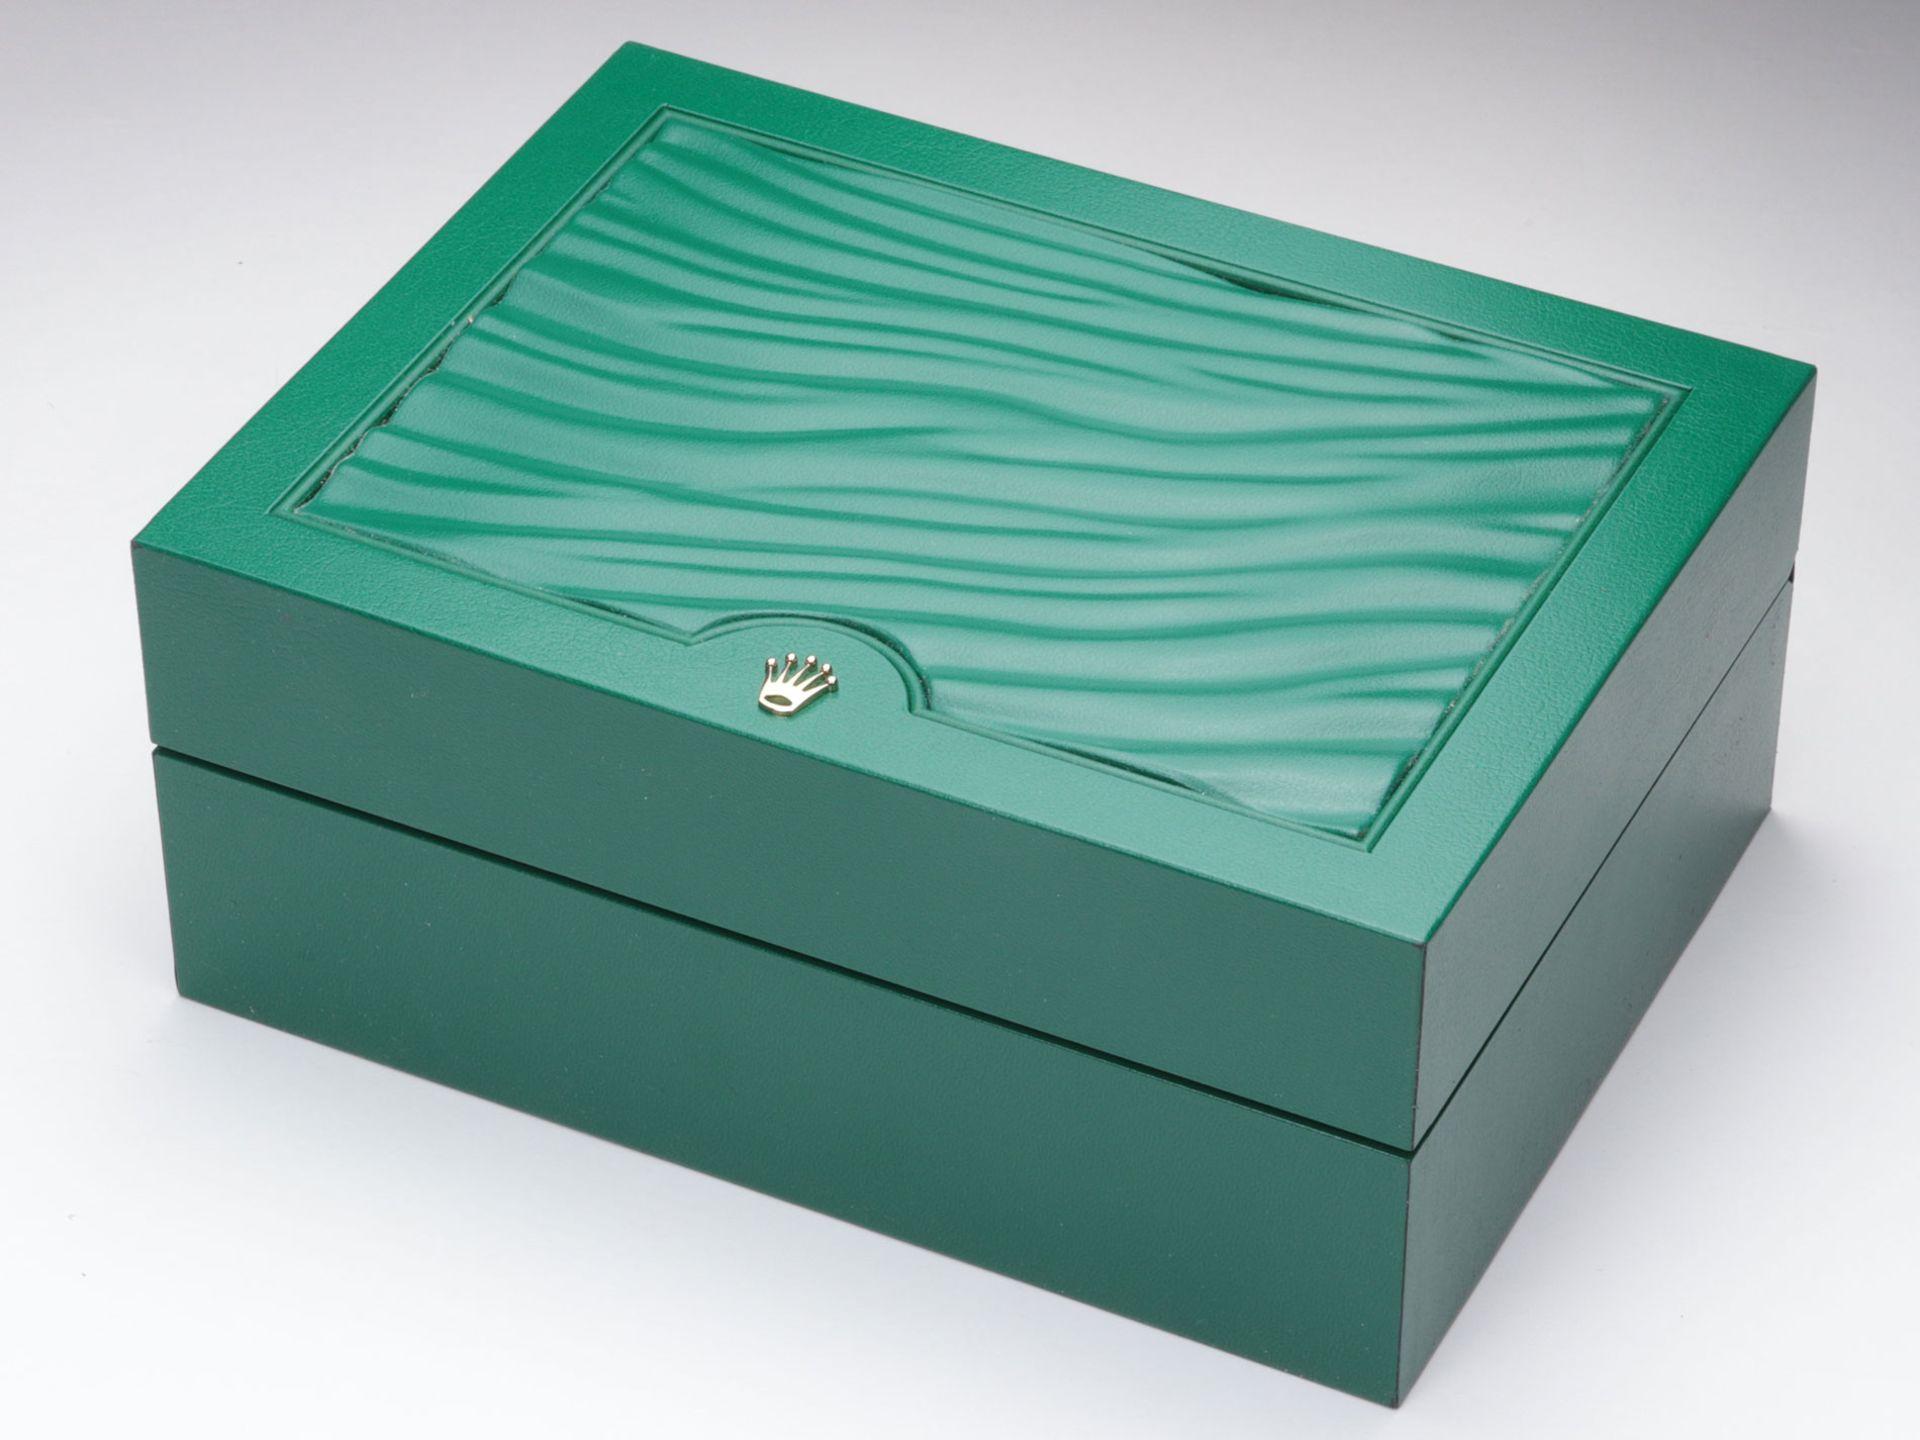 Rolex - Herrenarmbanduhr Roségold 750, Rolex Day-Date Oyster Perpetual, Superlative C - Image 8 of 17